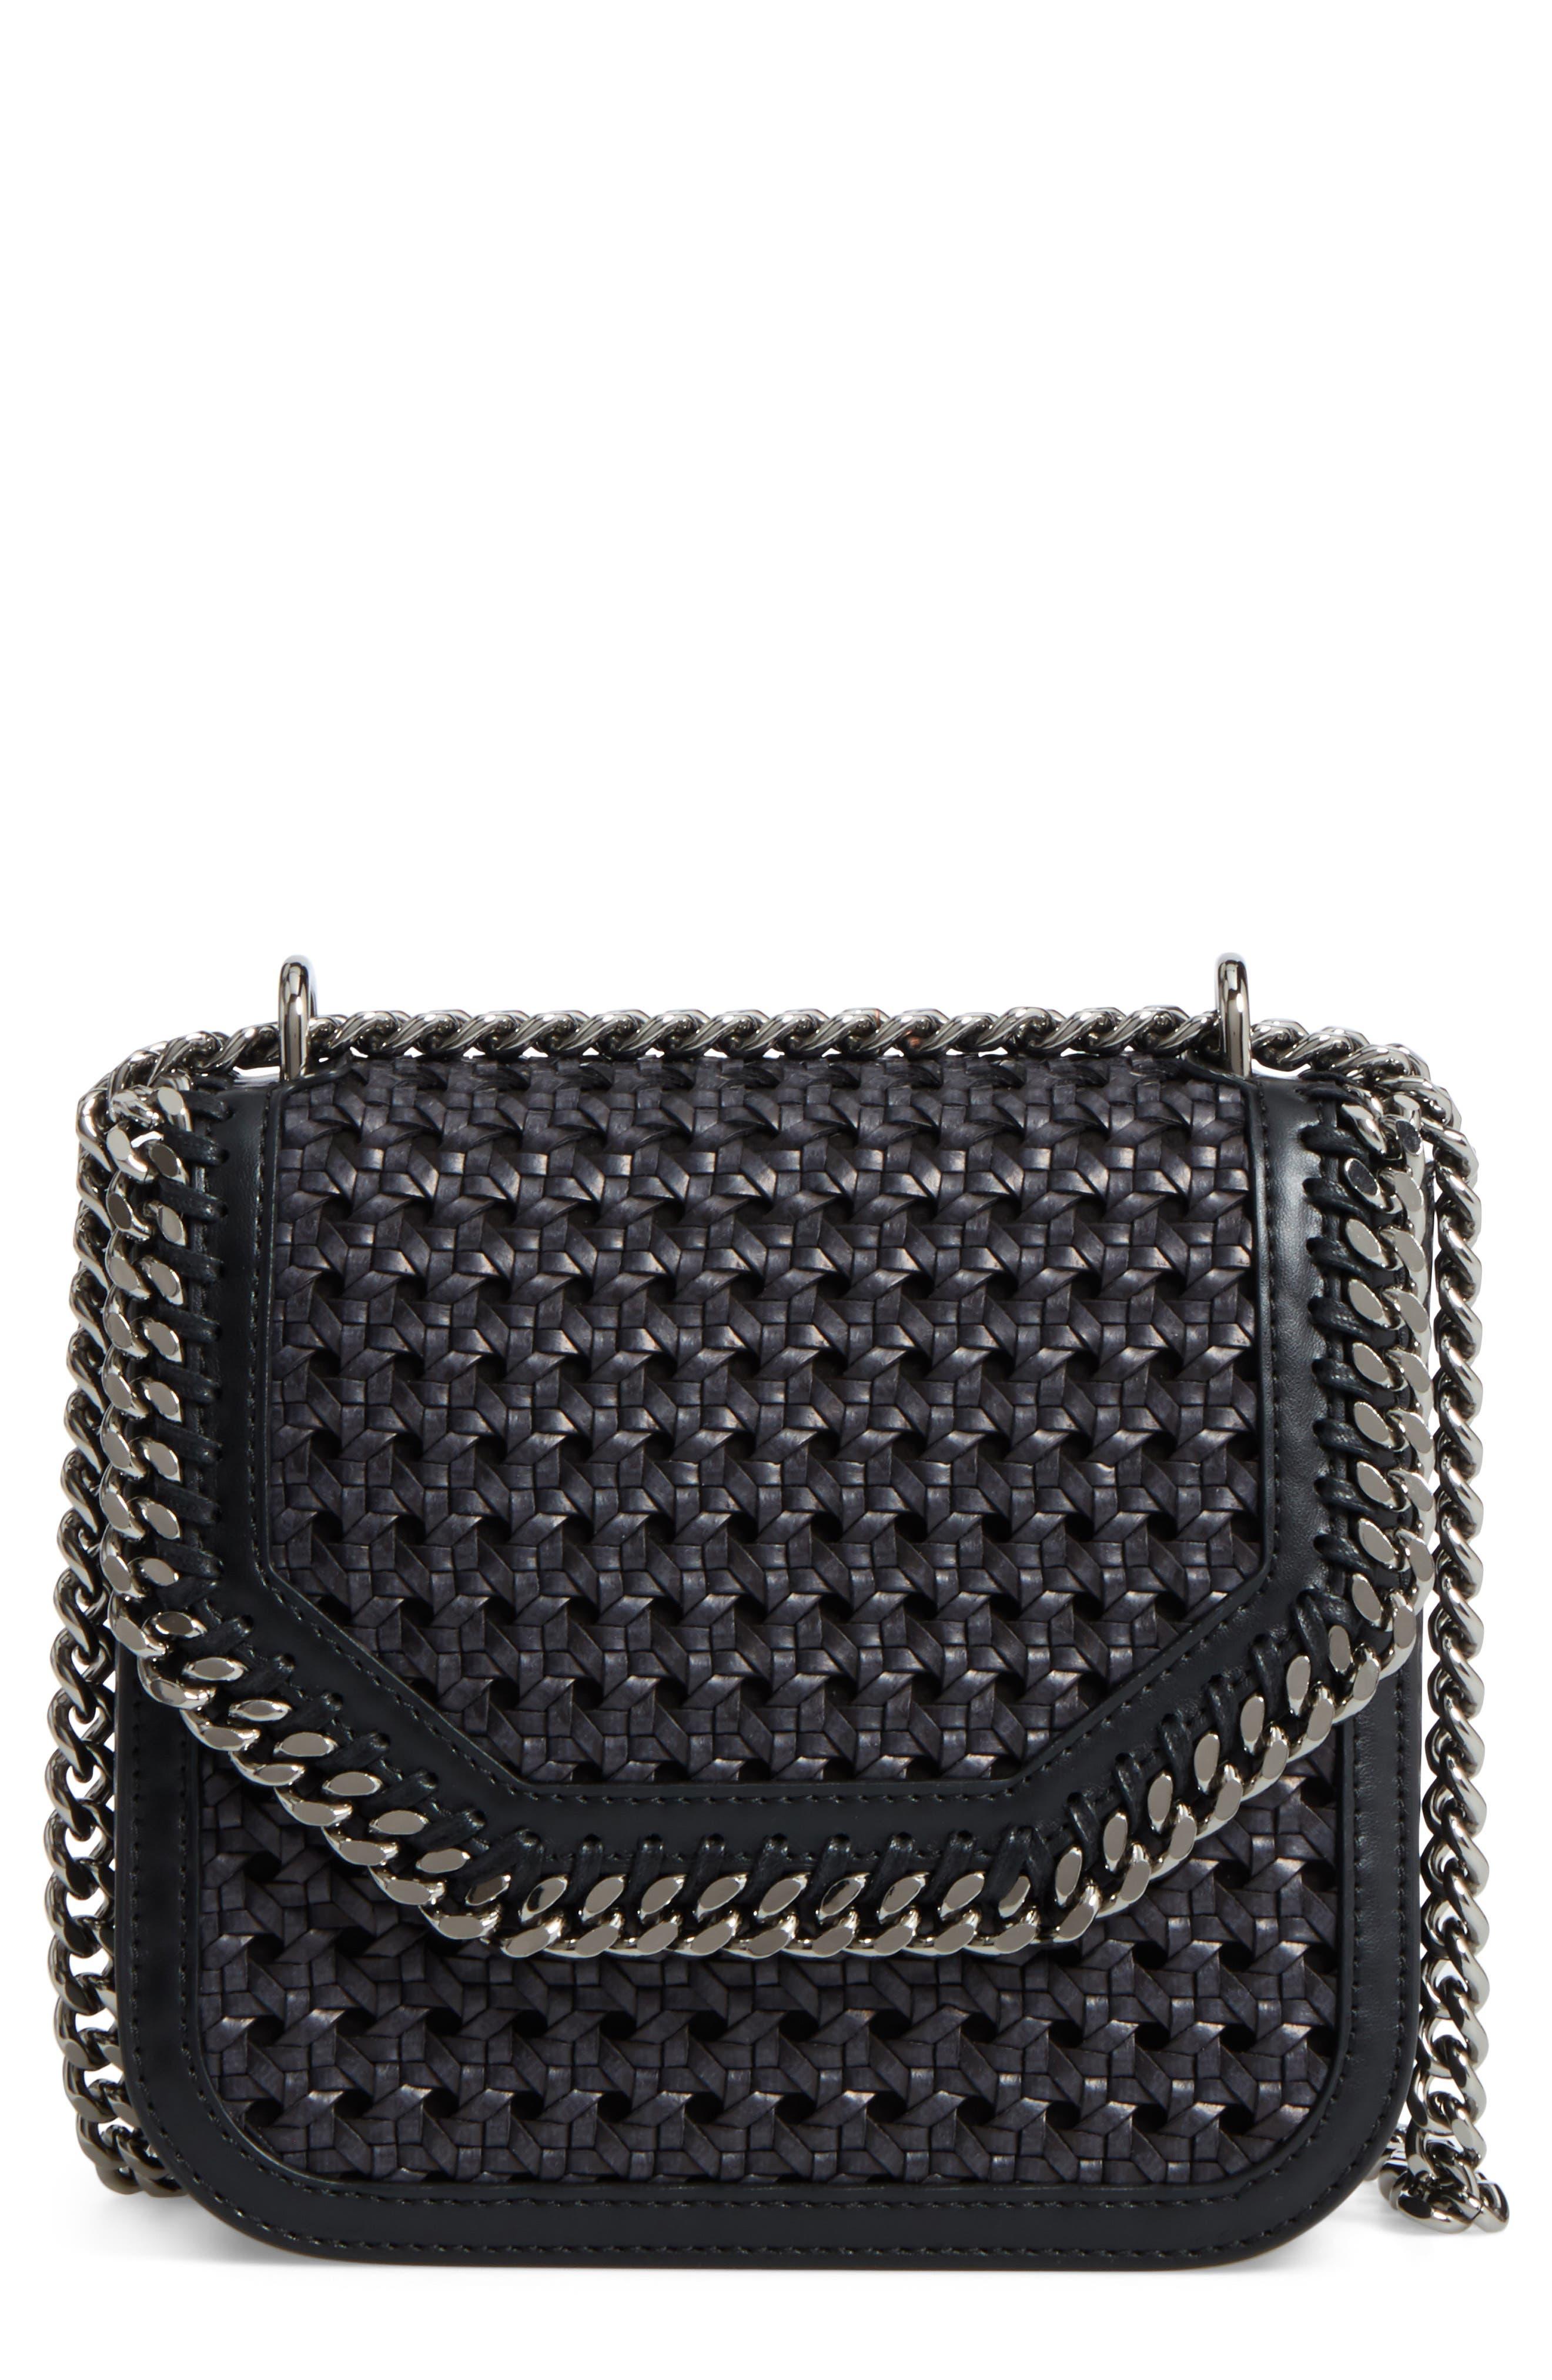 Stella McCartney Falabella Box Woven Faux Leather Shoulder Bag